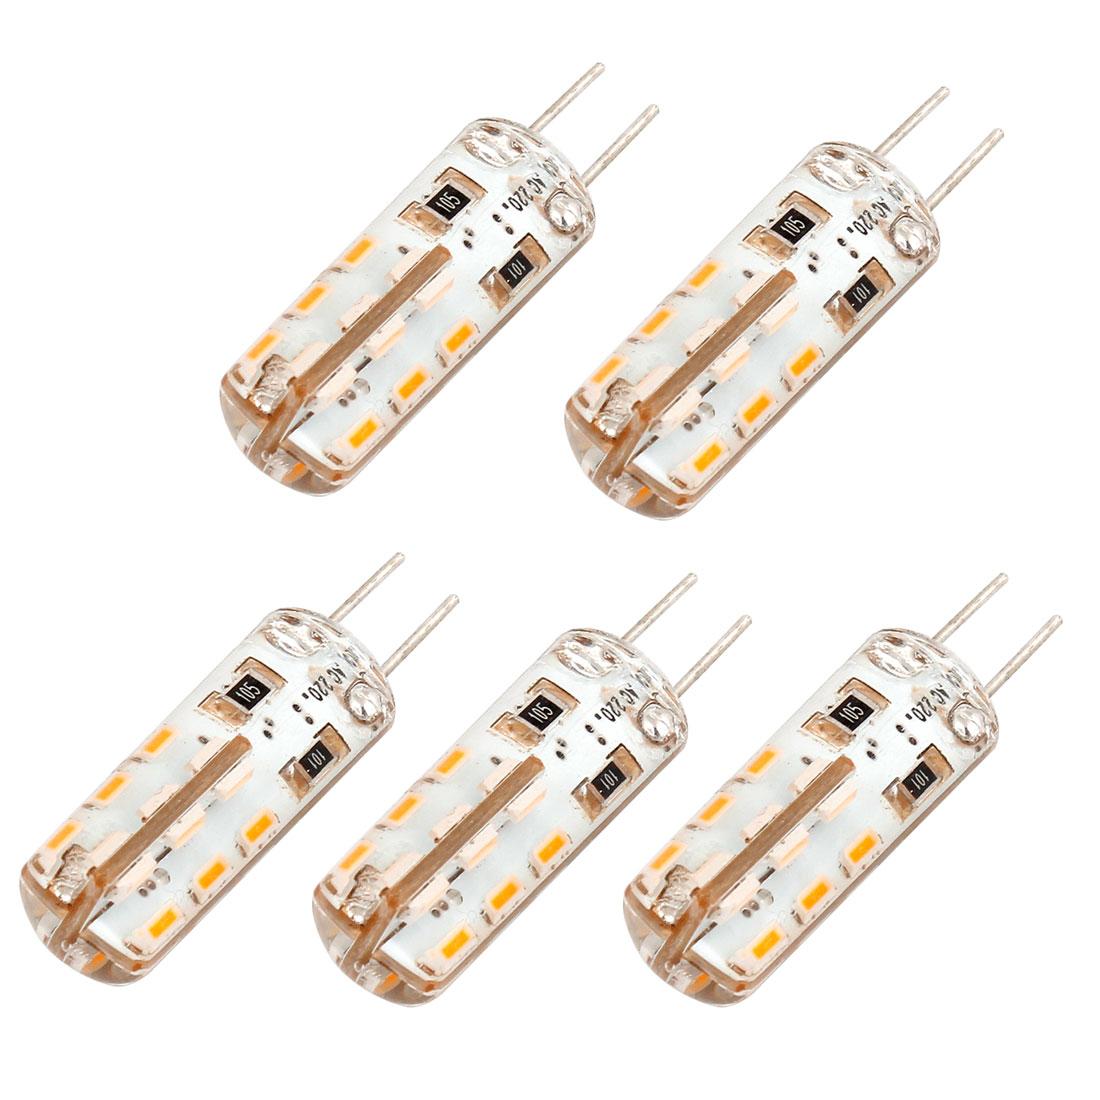 5 Pcs G4 2W 100-120LM 24 3014 SMD LED Light Lamp Bulb Warm White AC220V 2W